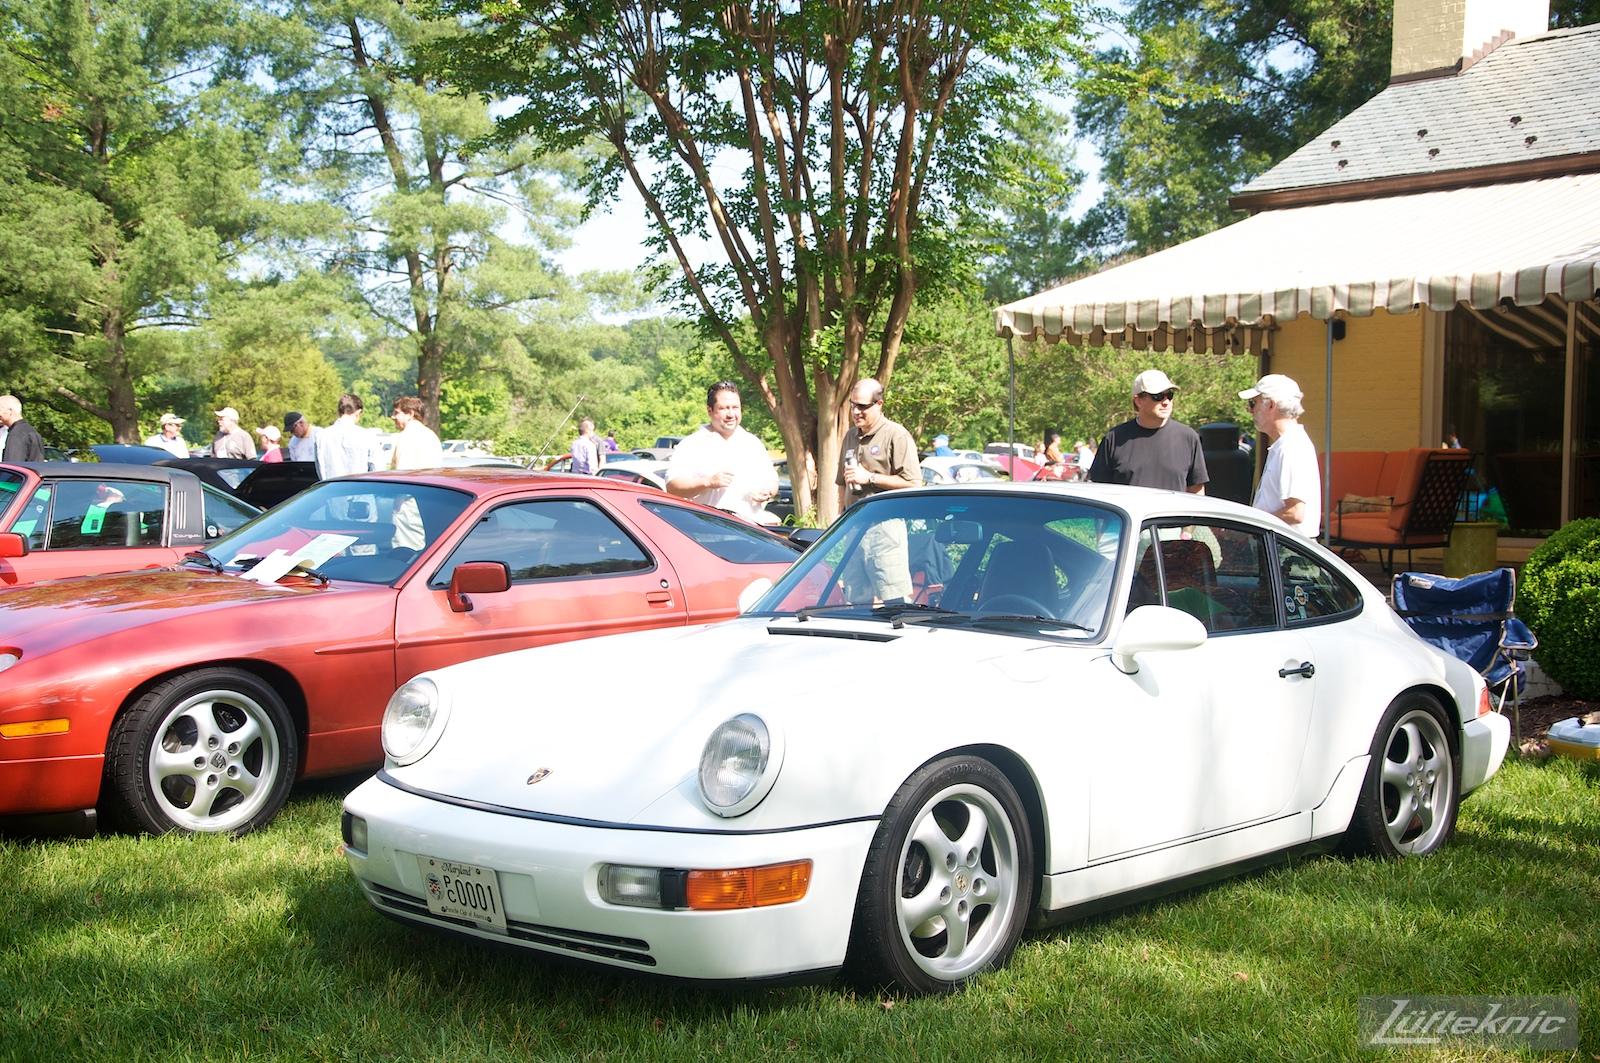 Clean white 964 coupe at the Richmond Porsche Meet.